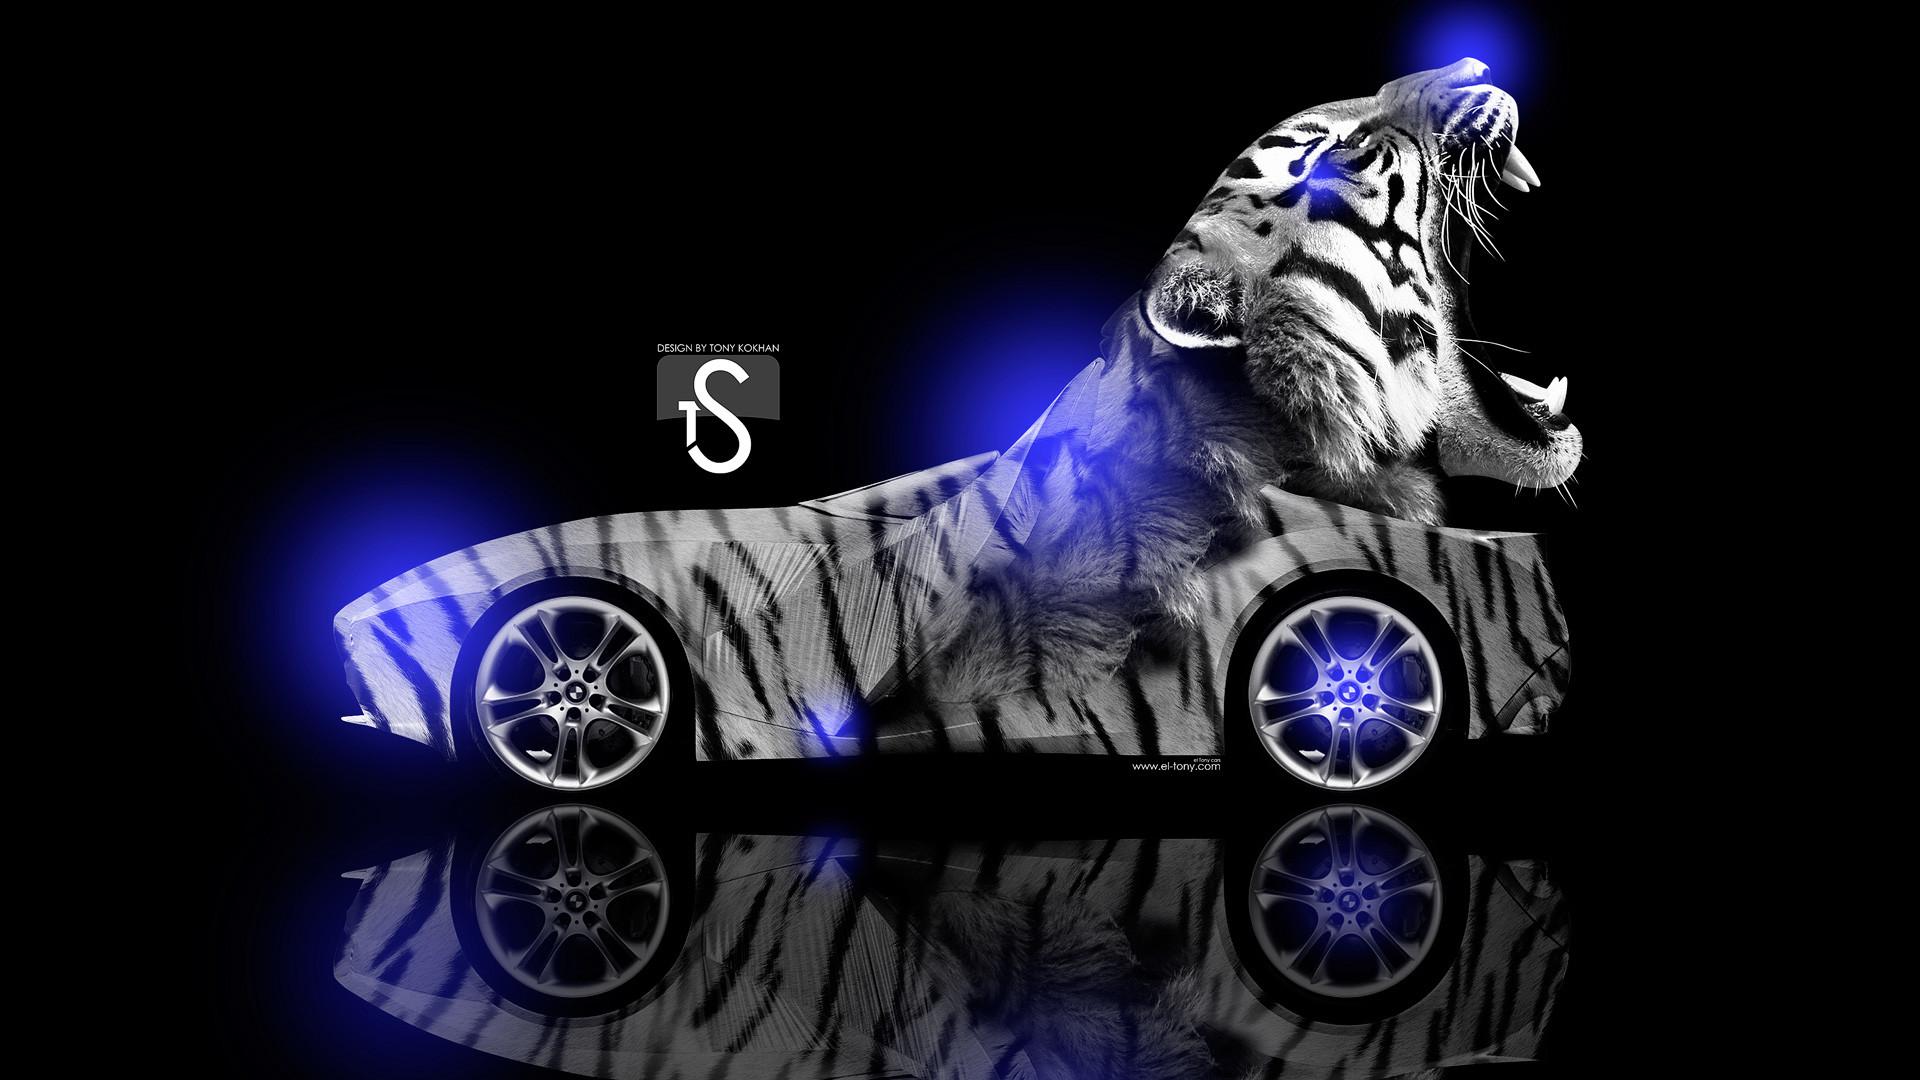 … BMW-Gina-Light-Visions-Tiger-Blue-Neon-2013- …